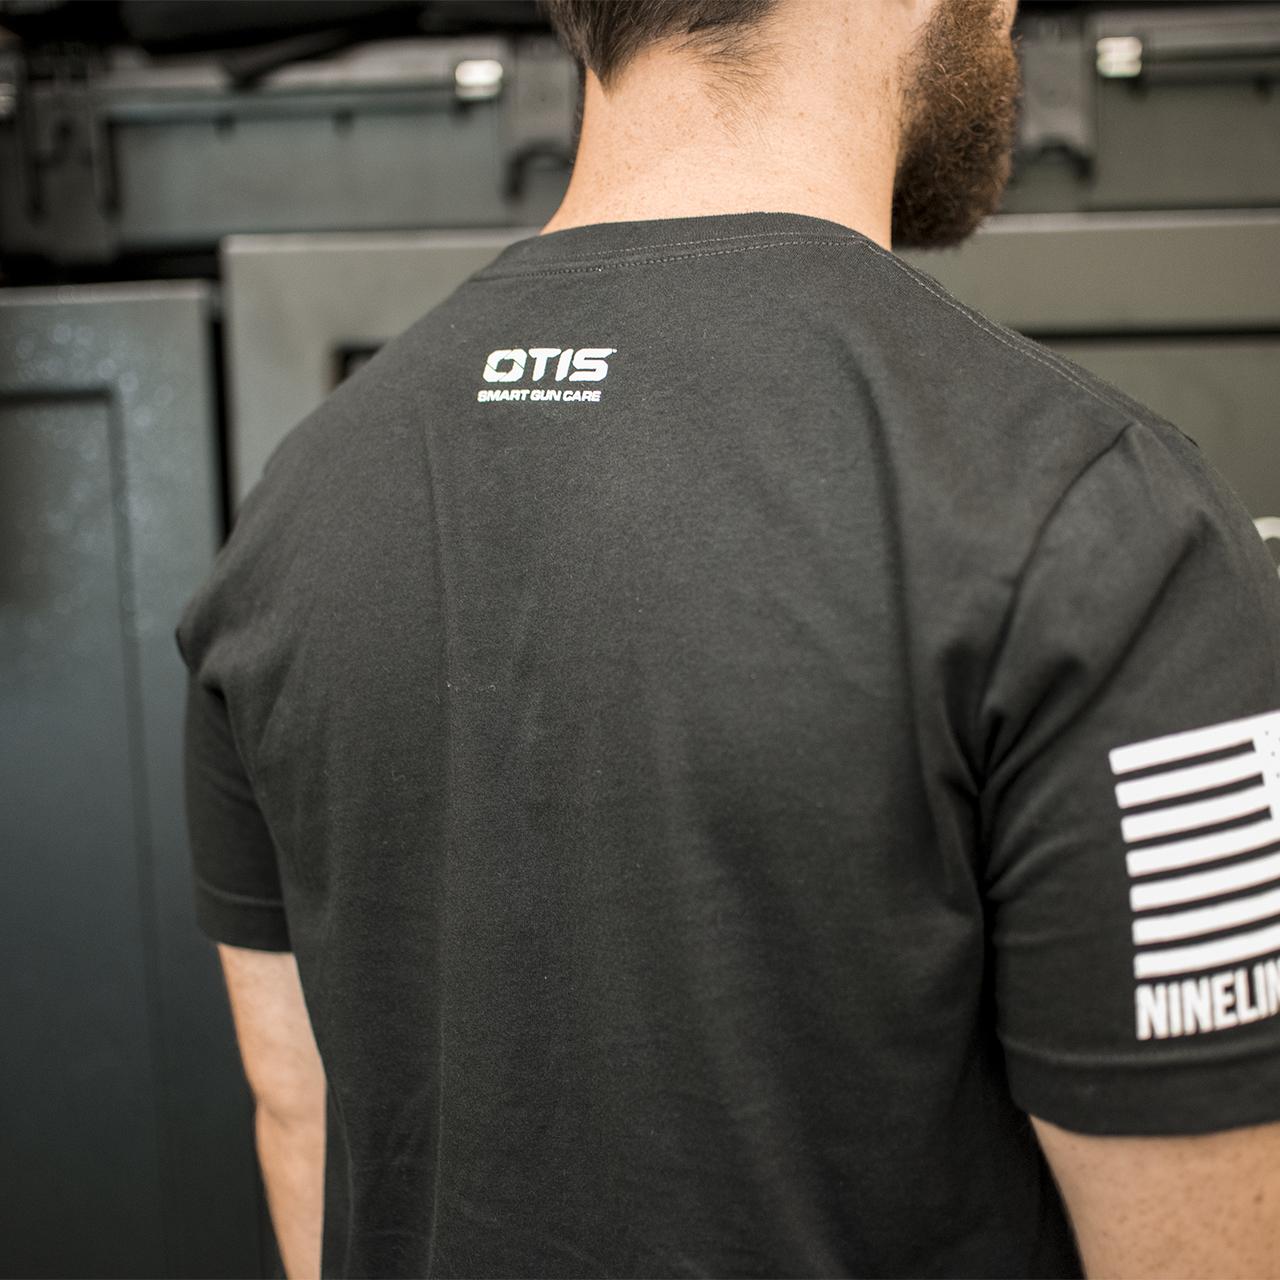 Otis Nine Line Plink T-Shirt